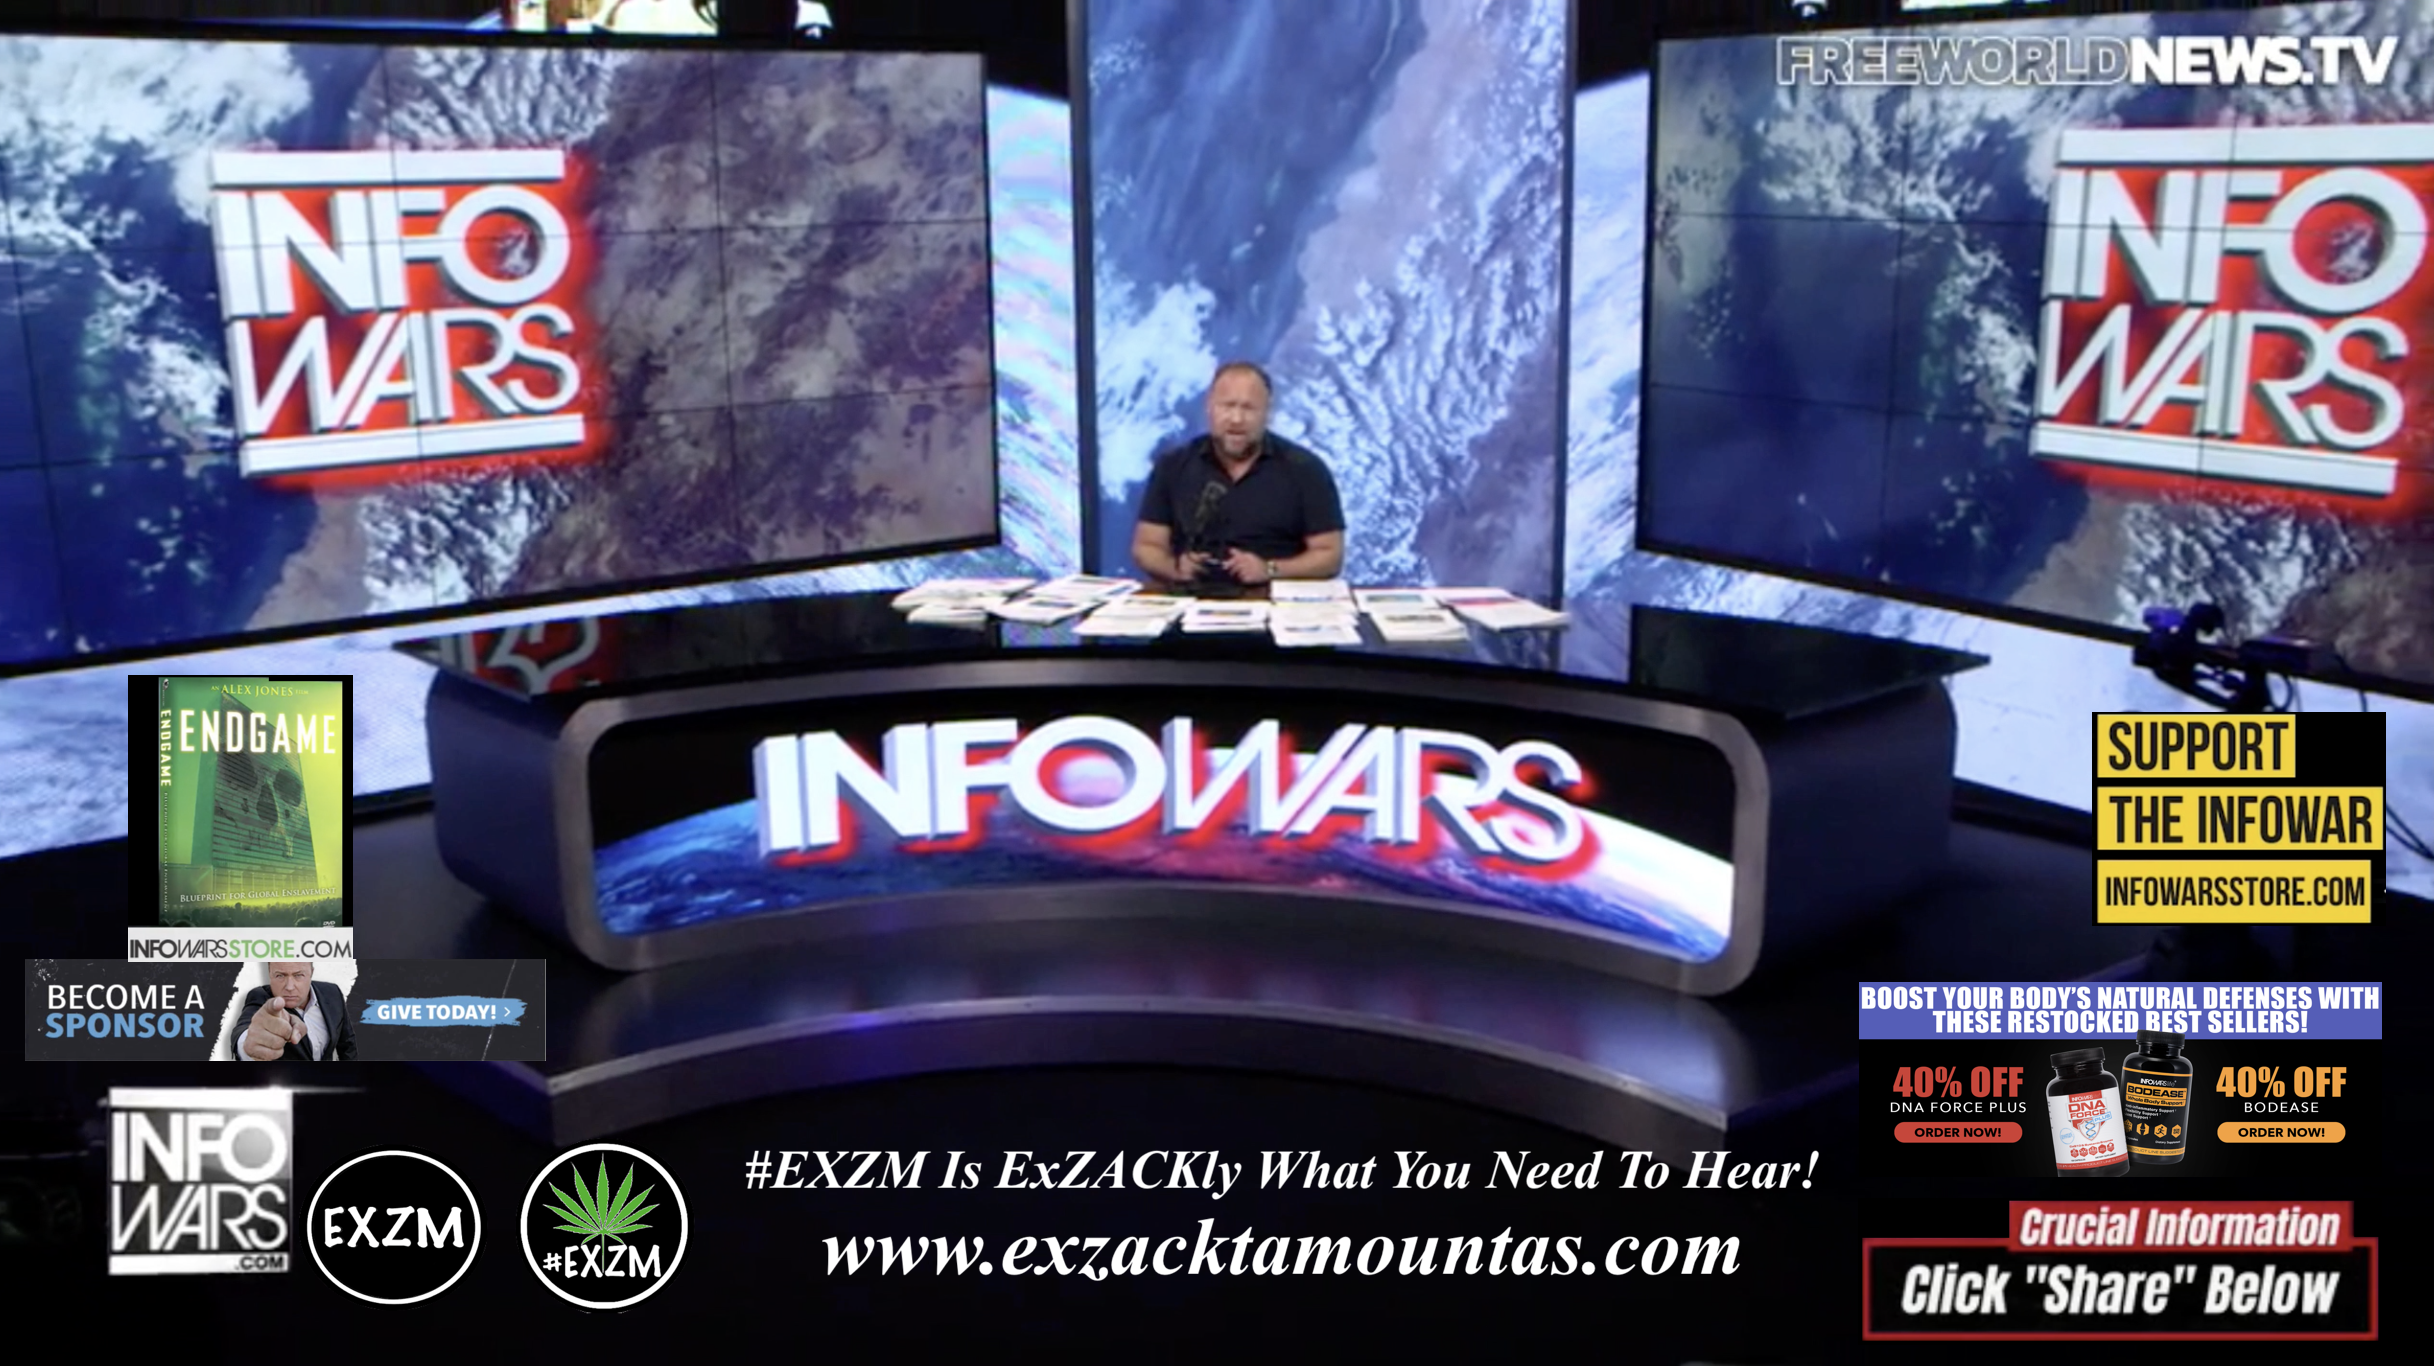 Alex Jones Live In Infowars Studio Free World News TV EXZM Zack Mount October 26th 2021 copy